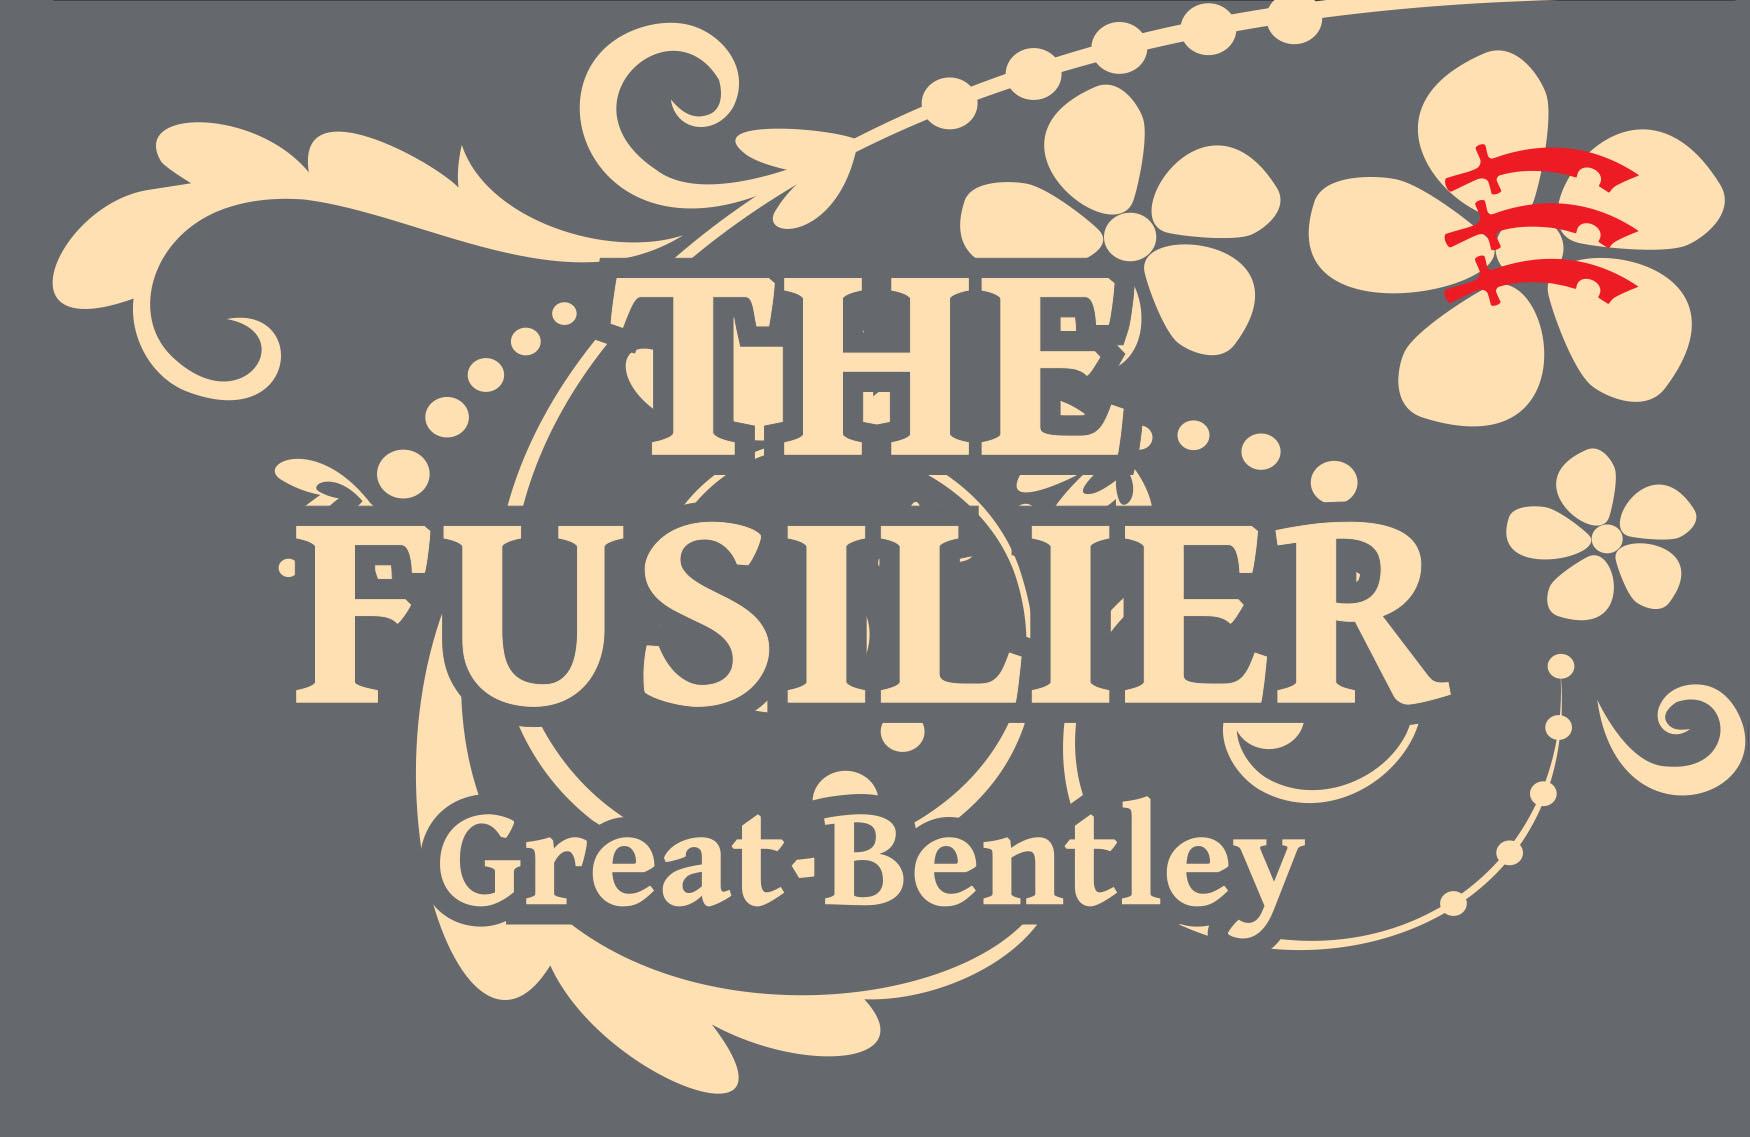 The Fusilier Bar & Restaurant